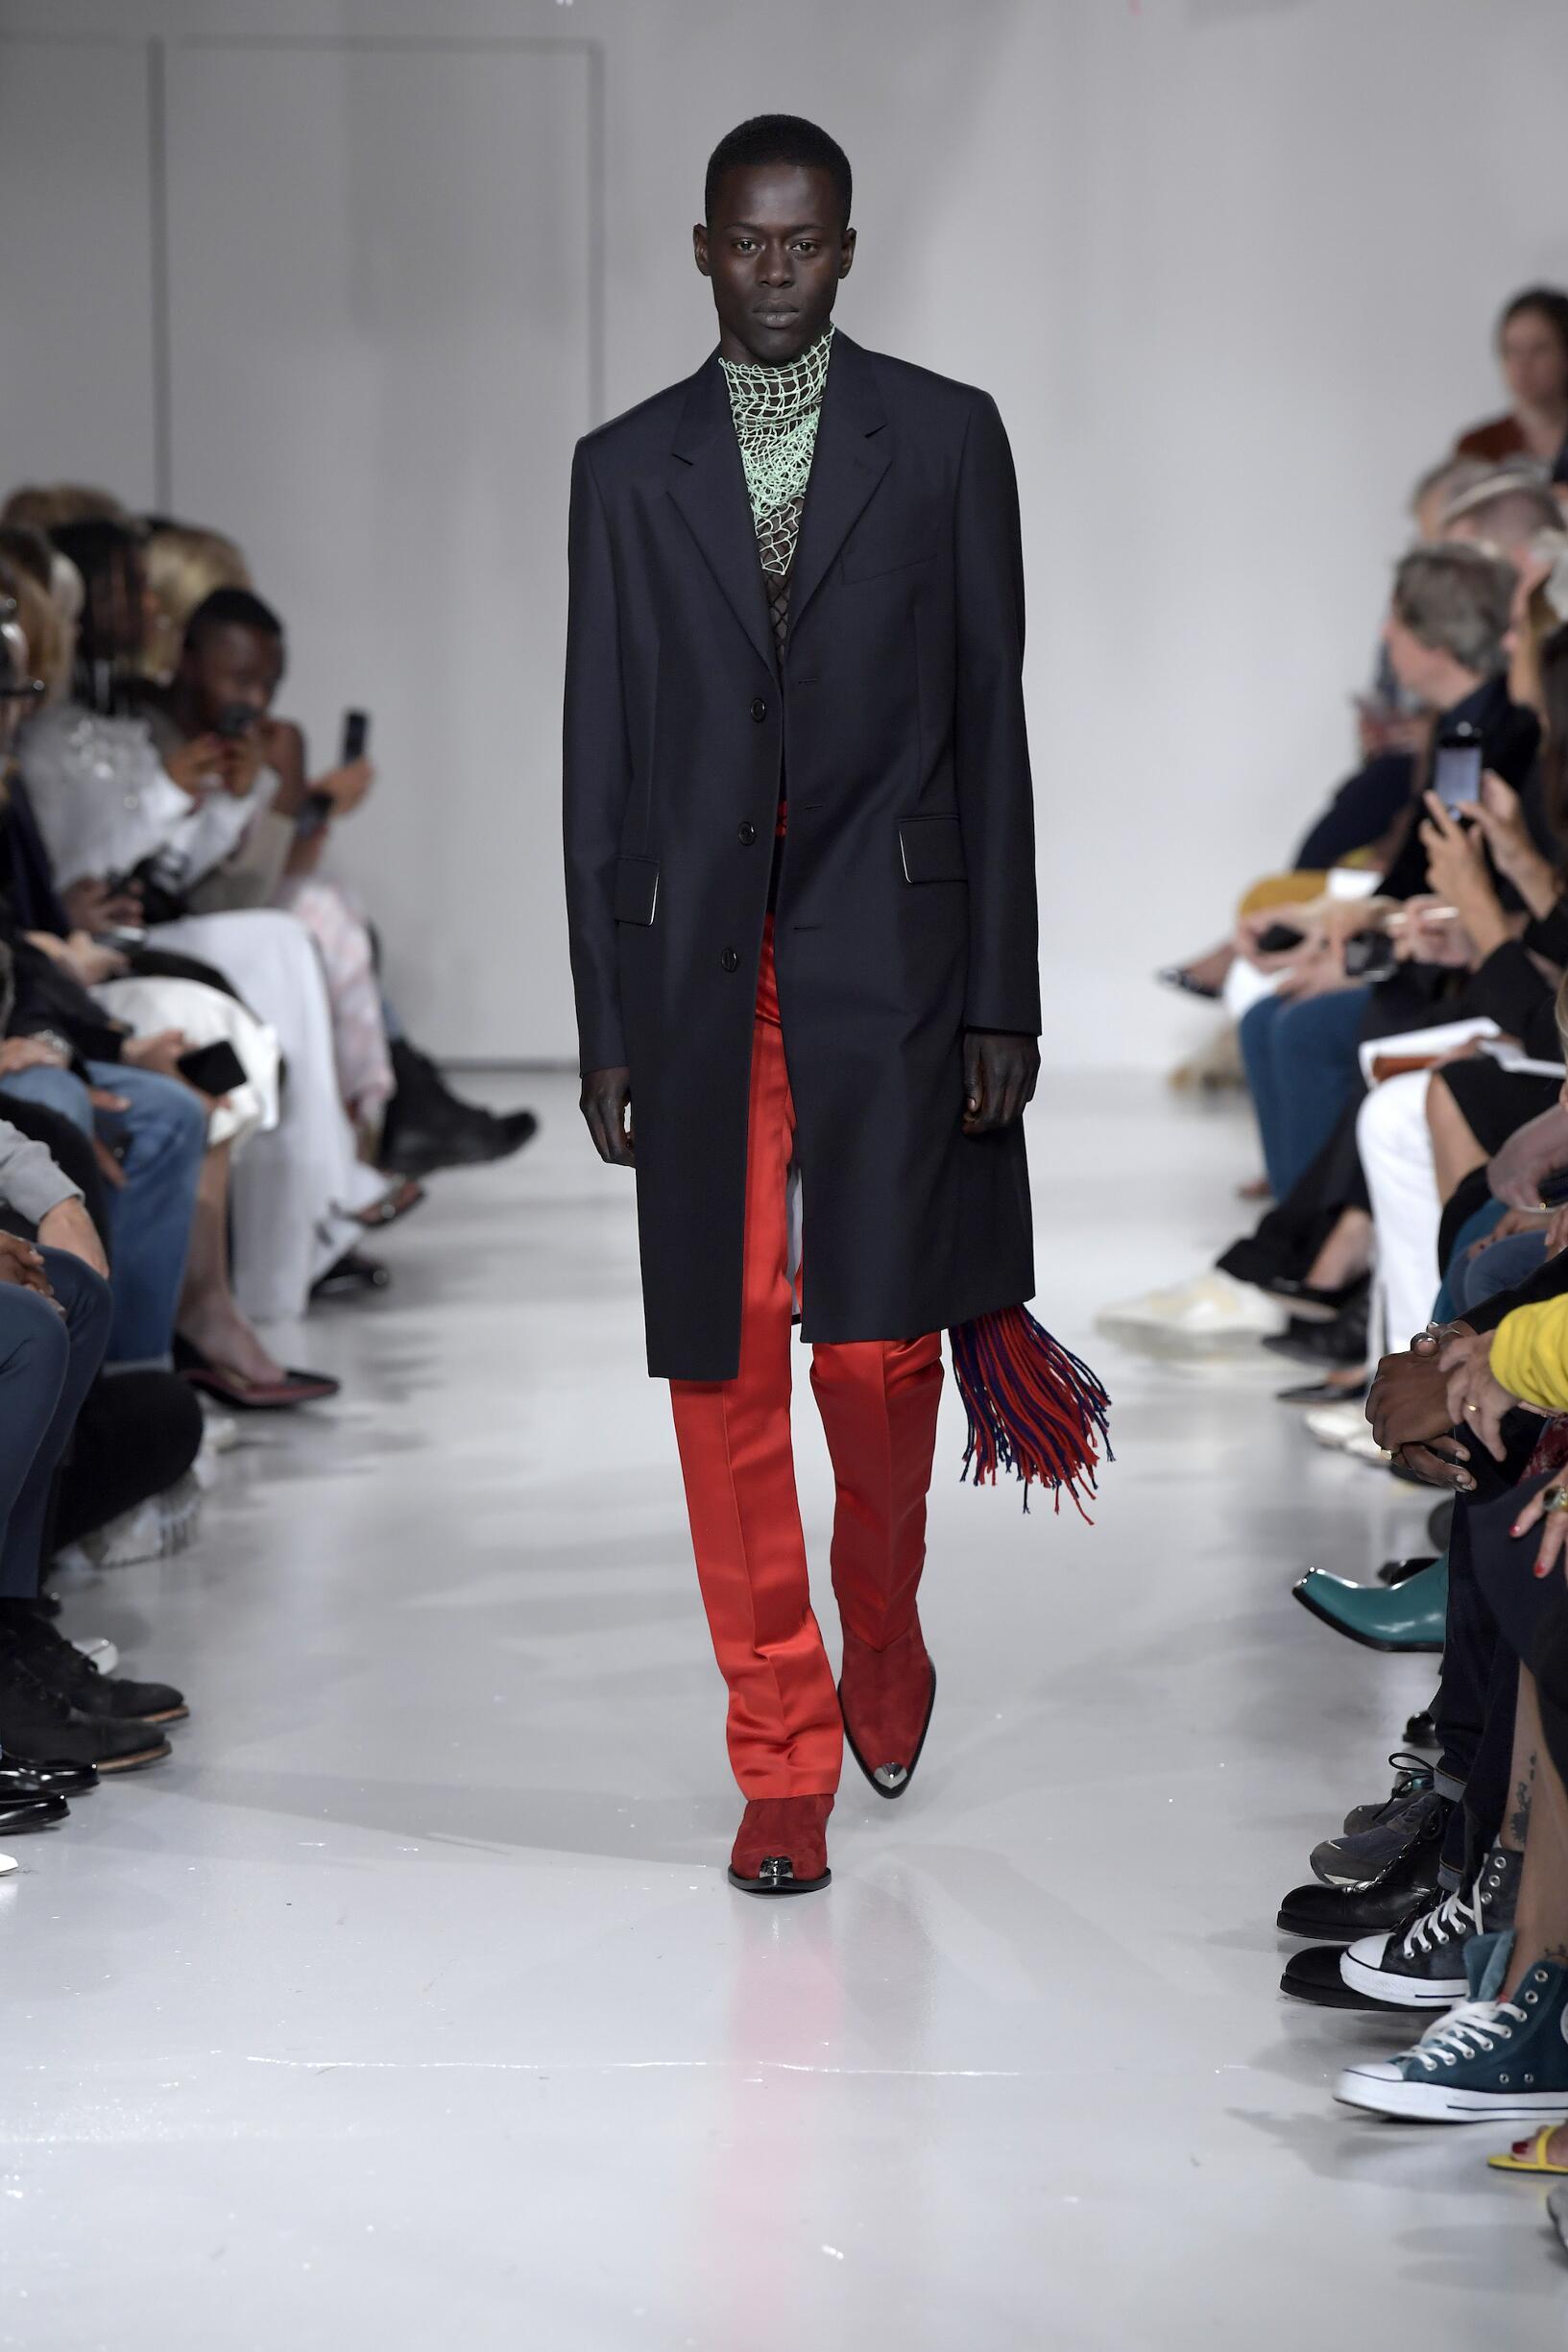 Model Fashion Week 2018 Catwalk Calvin Klein 205W39NYC